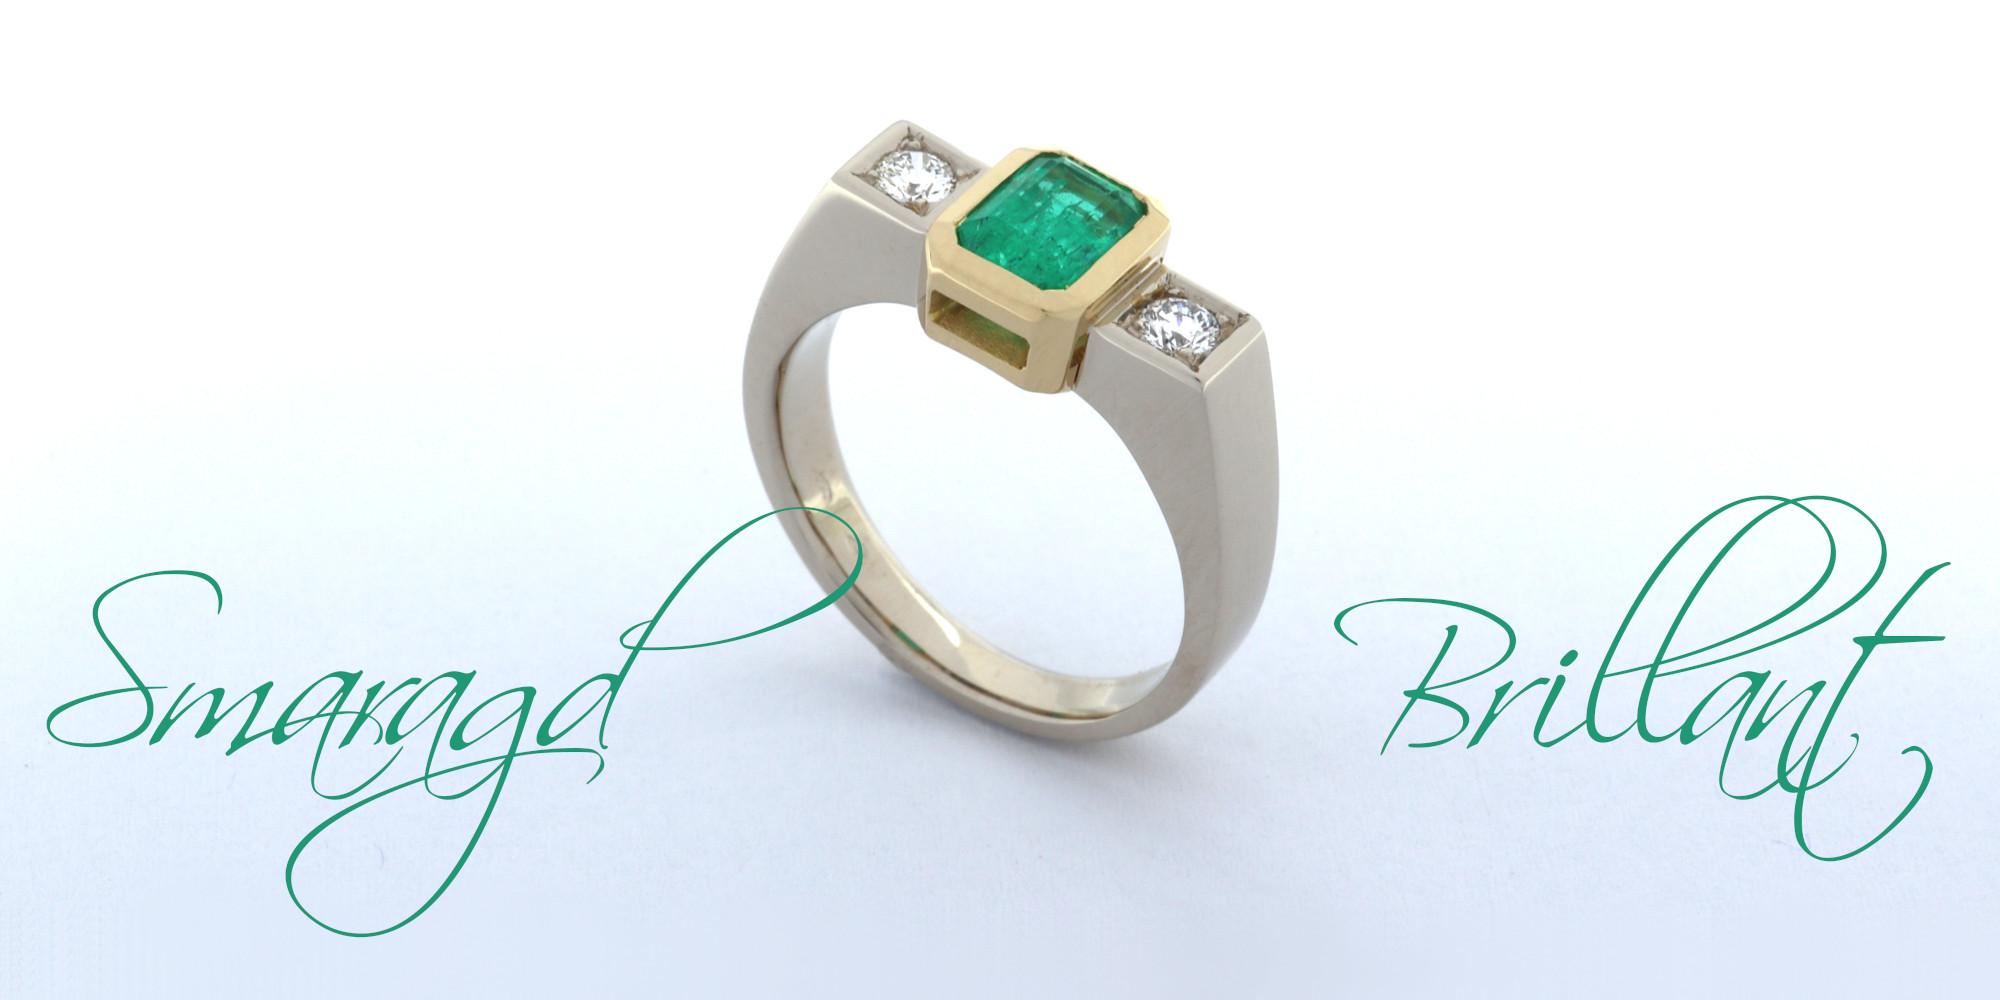 Smaragd Brillant Ring classic Goldschmiede Mace